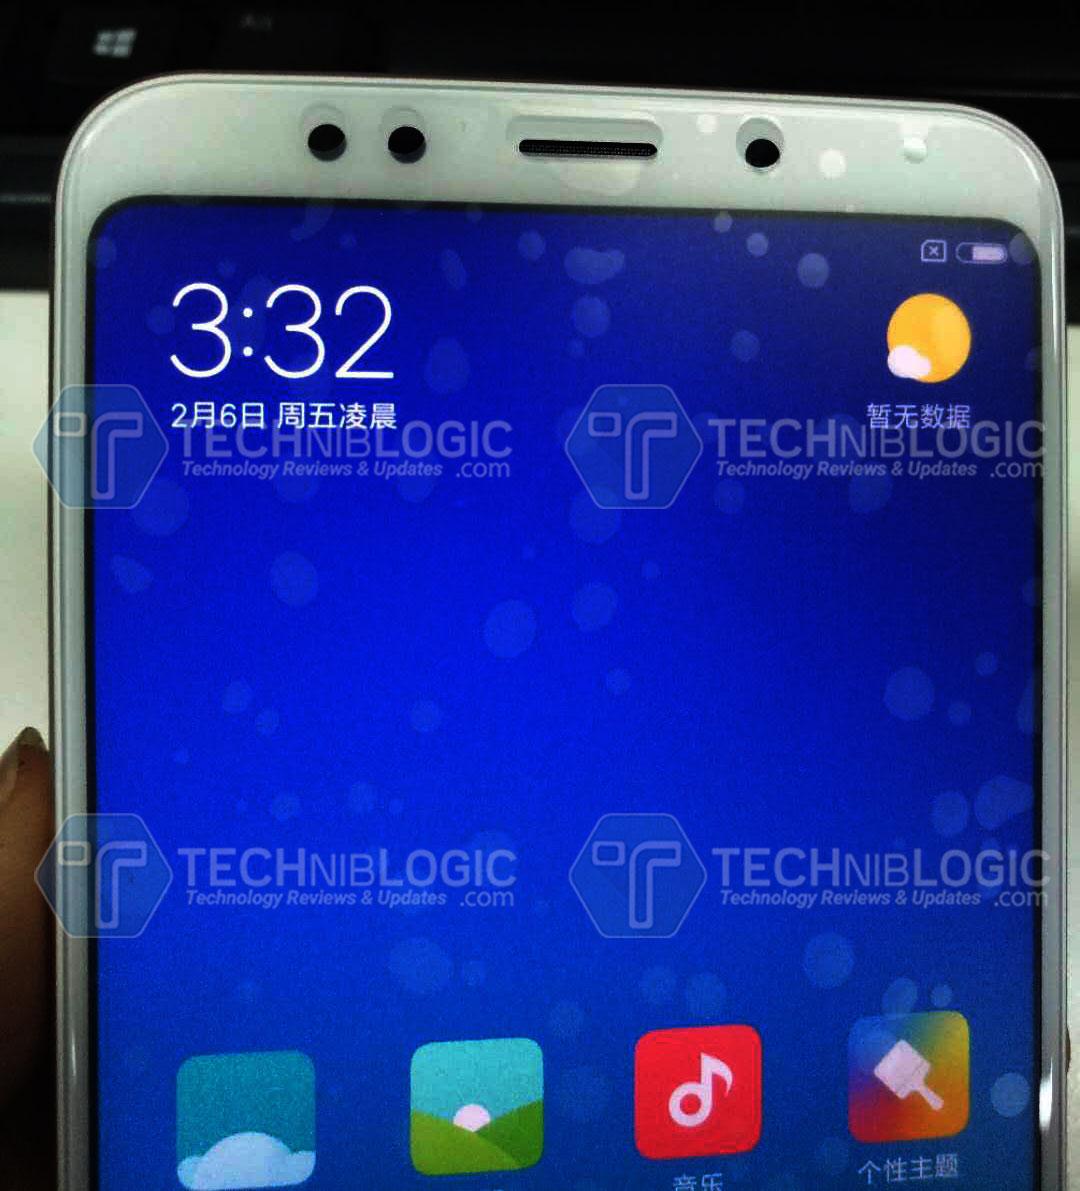 Xiaomi Redmi 5 Plus price, specifications, features Explained 1